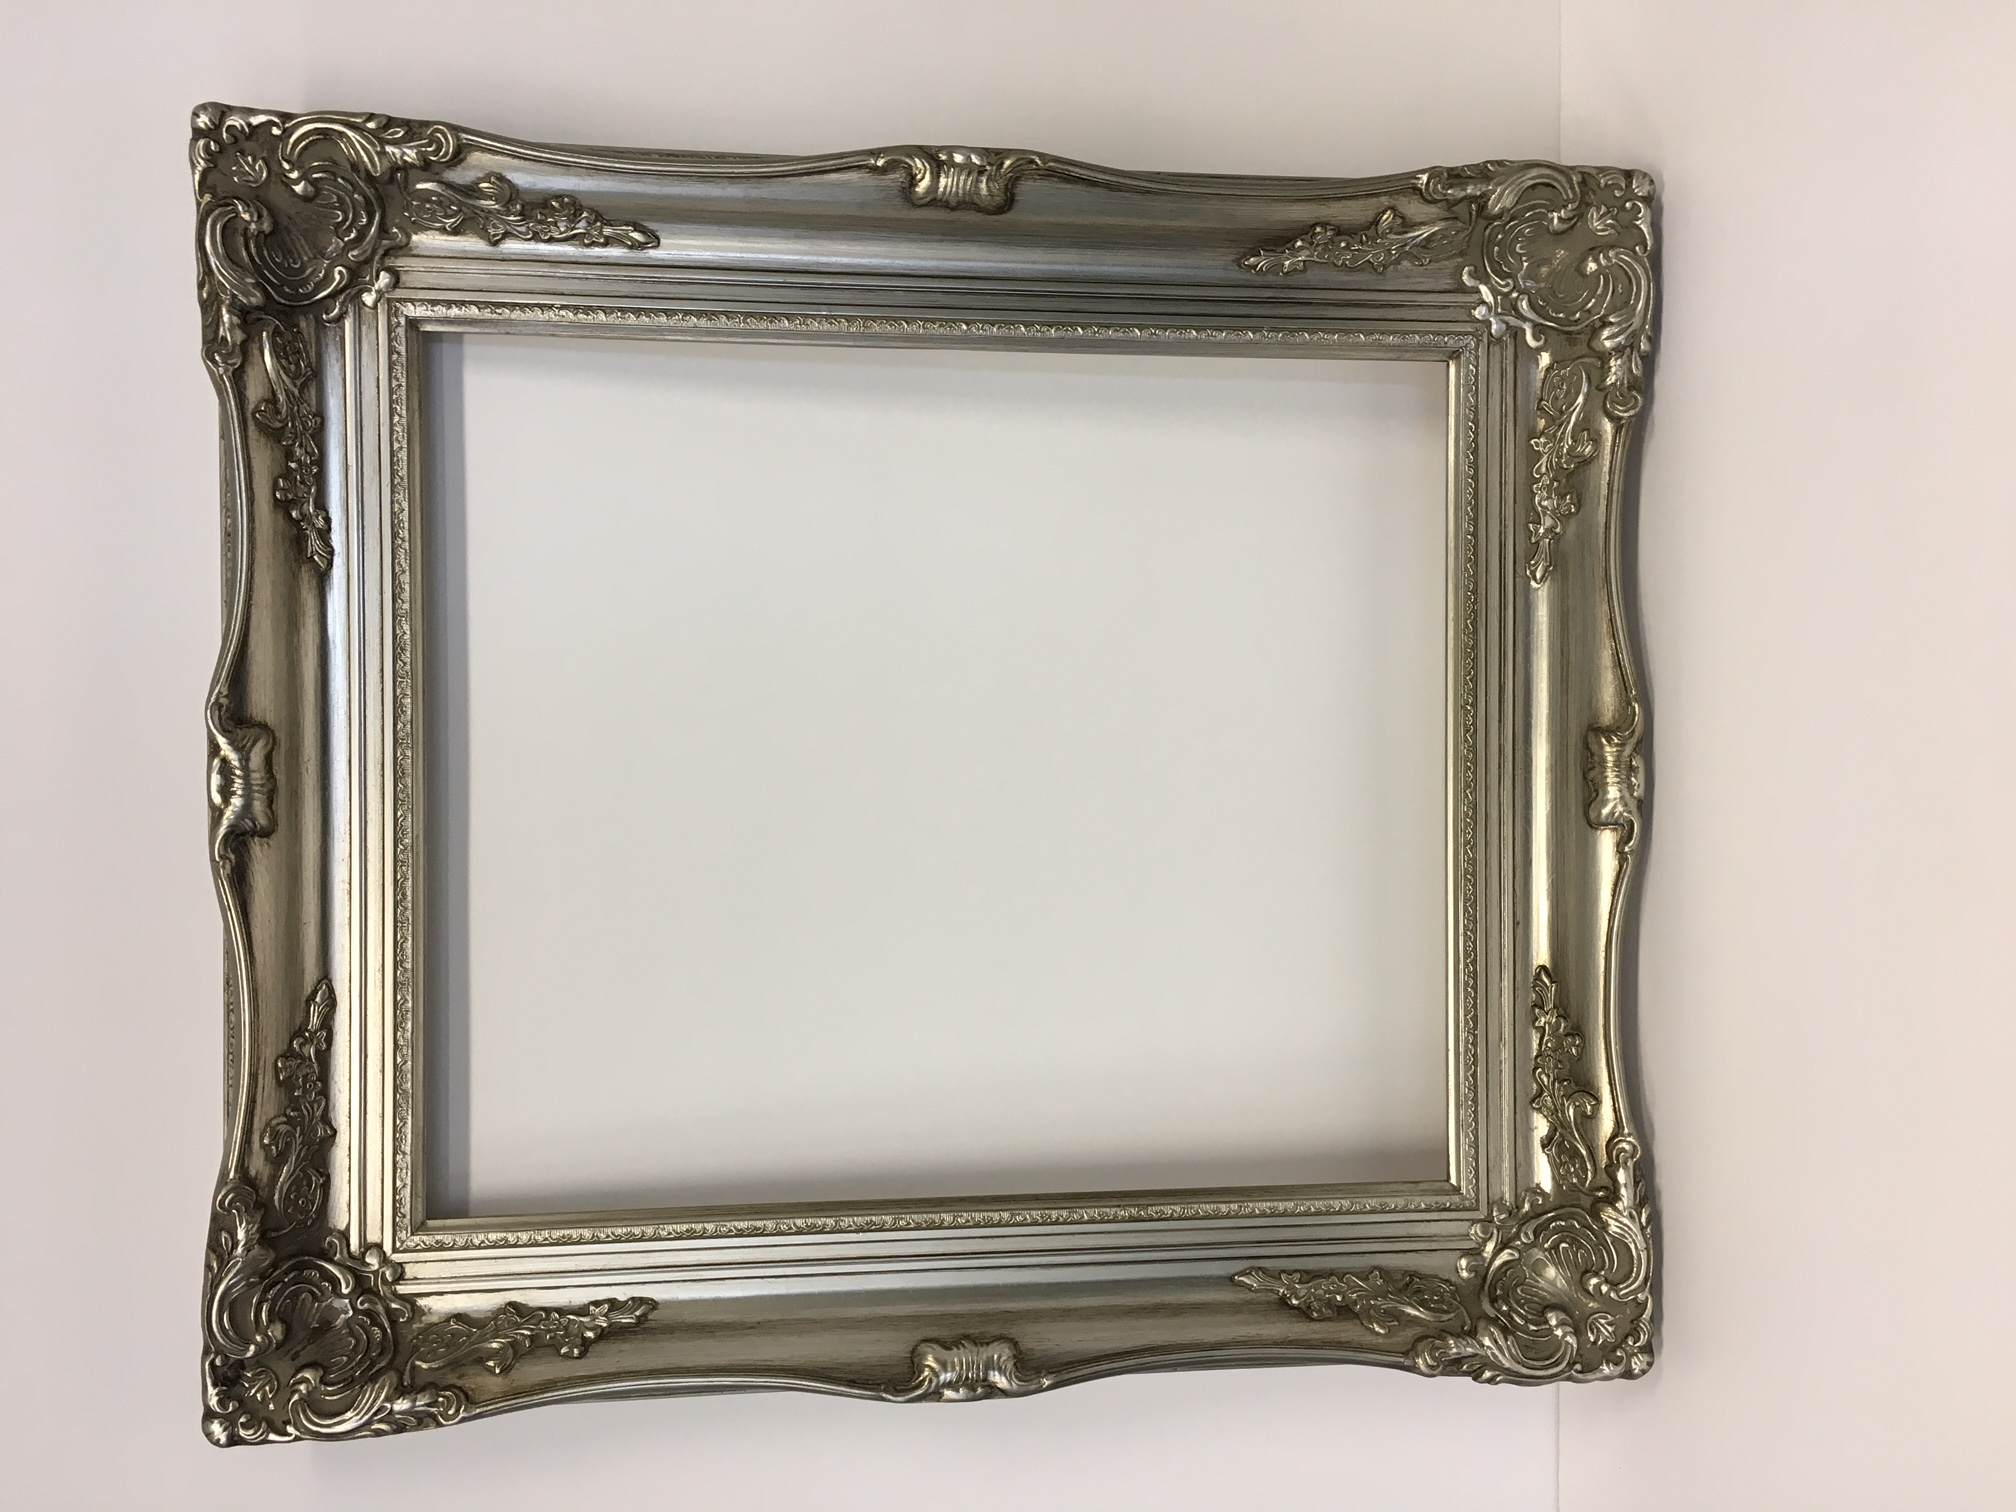 Dorable Gold And Silver Picture Frames Regalo - Ideas de Arte ...